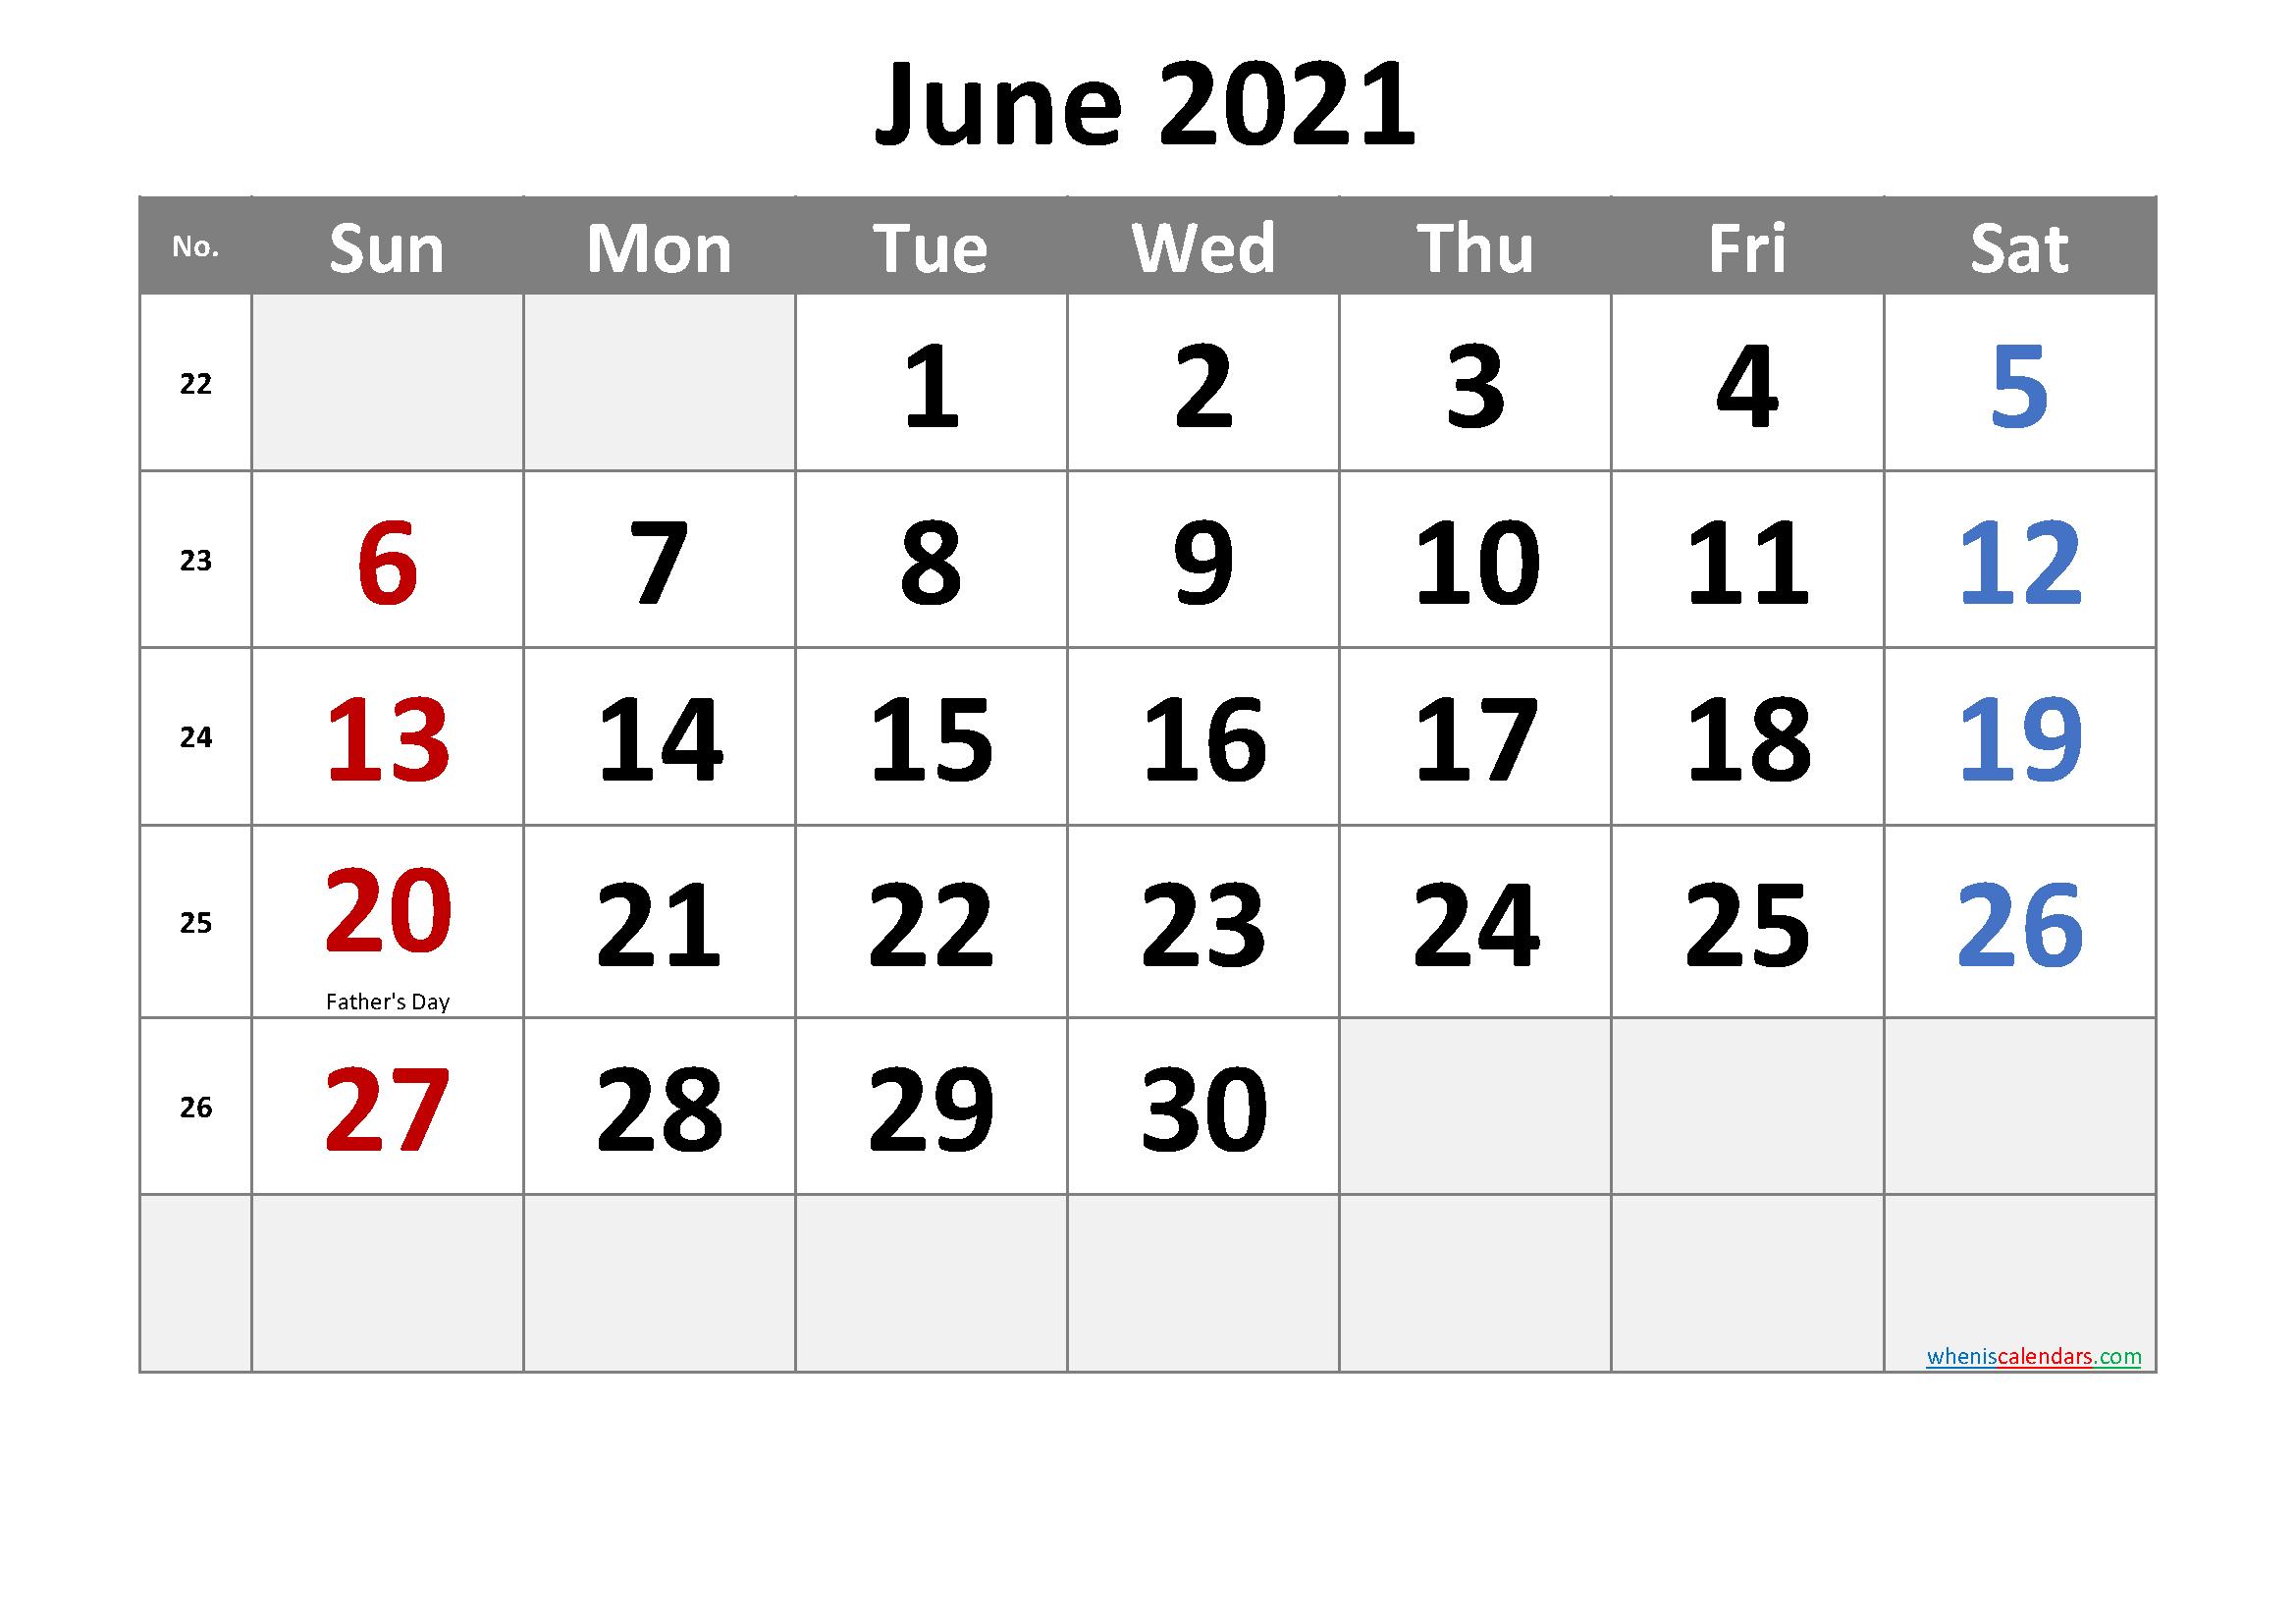 Free Printable February 2021 Calendar With Holidays - 6